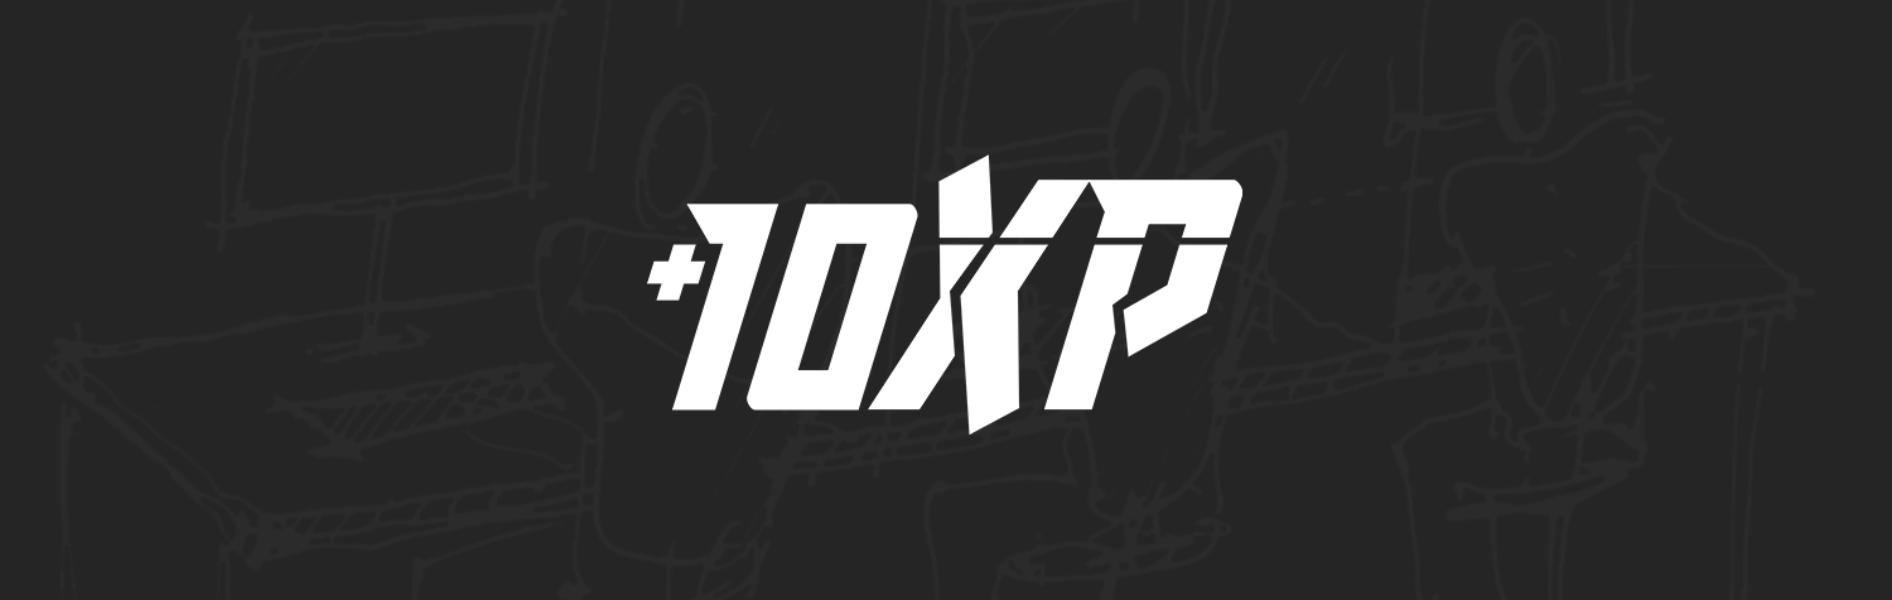 10XP Banner